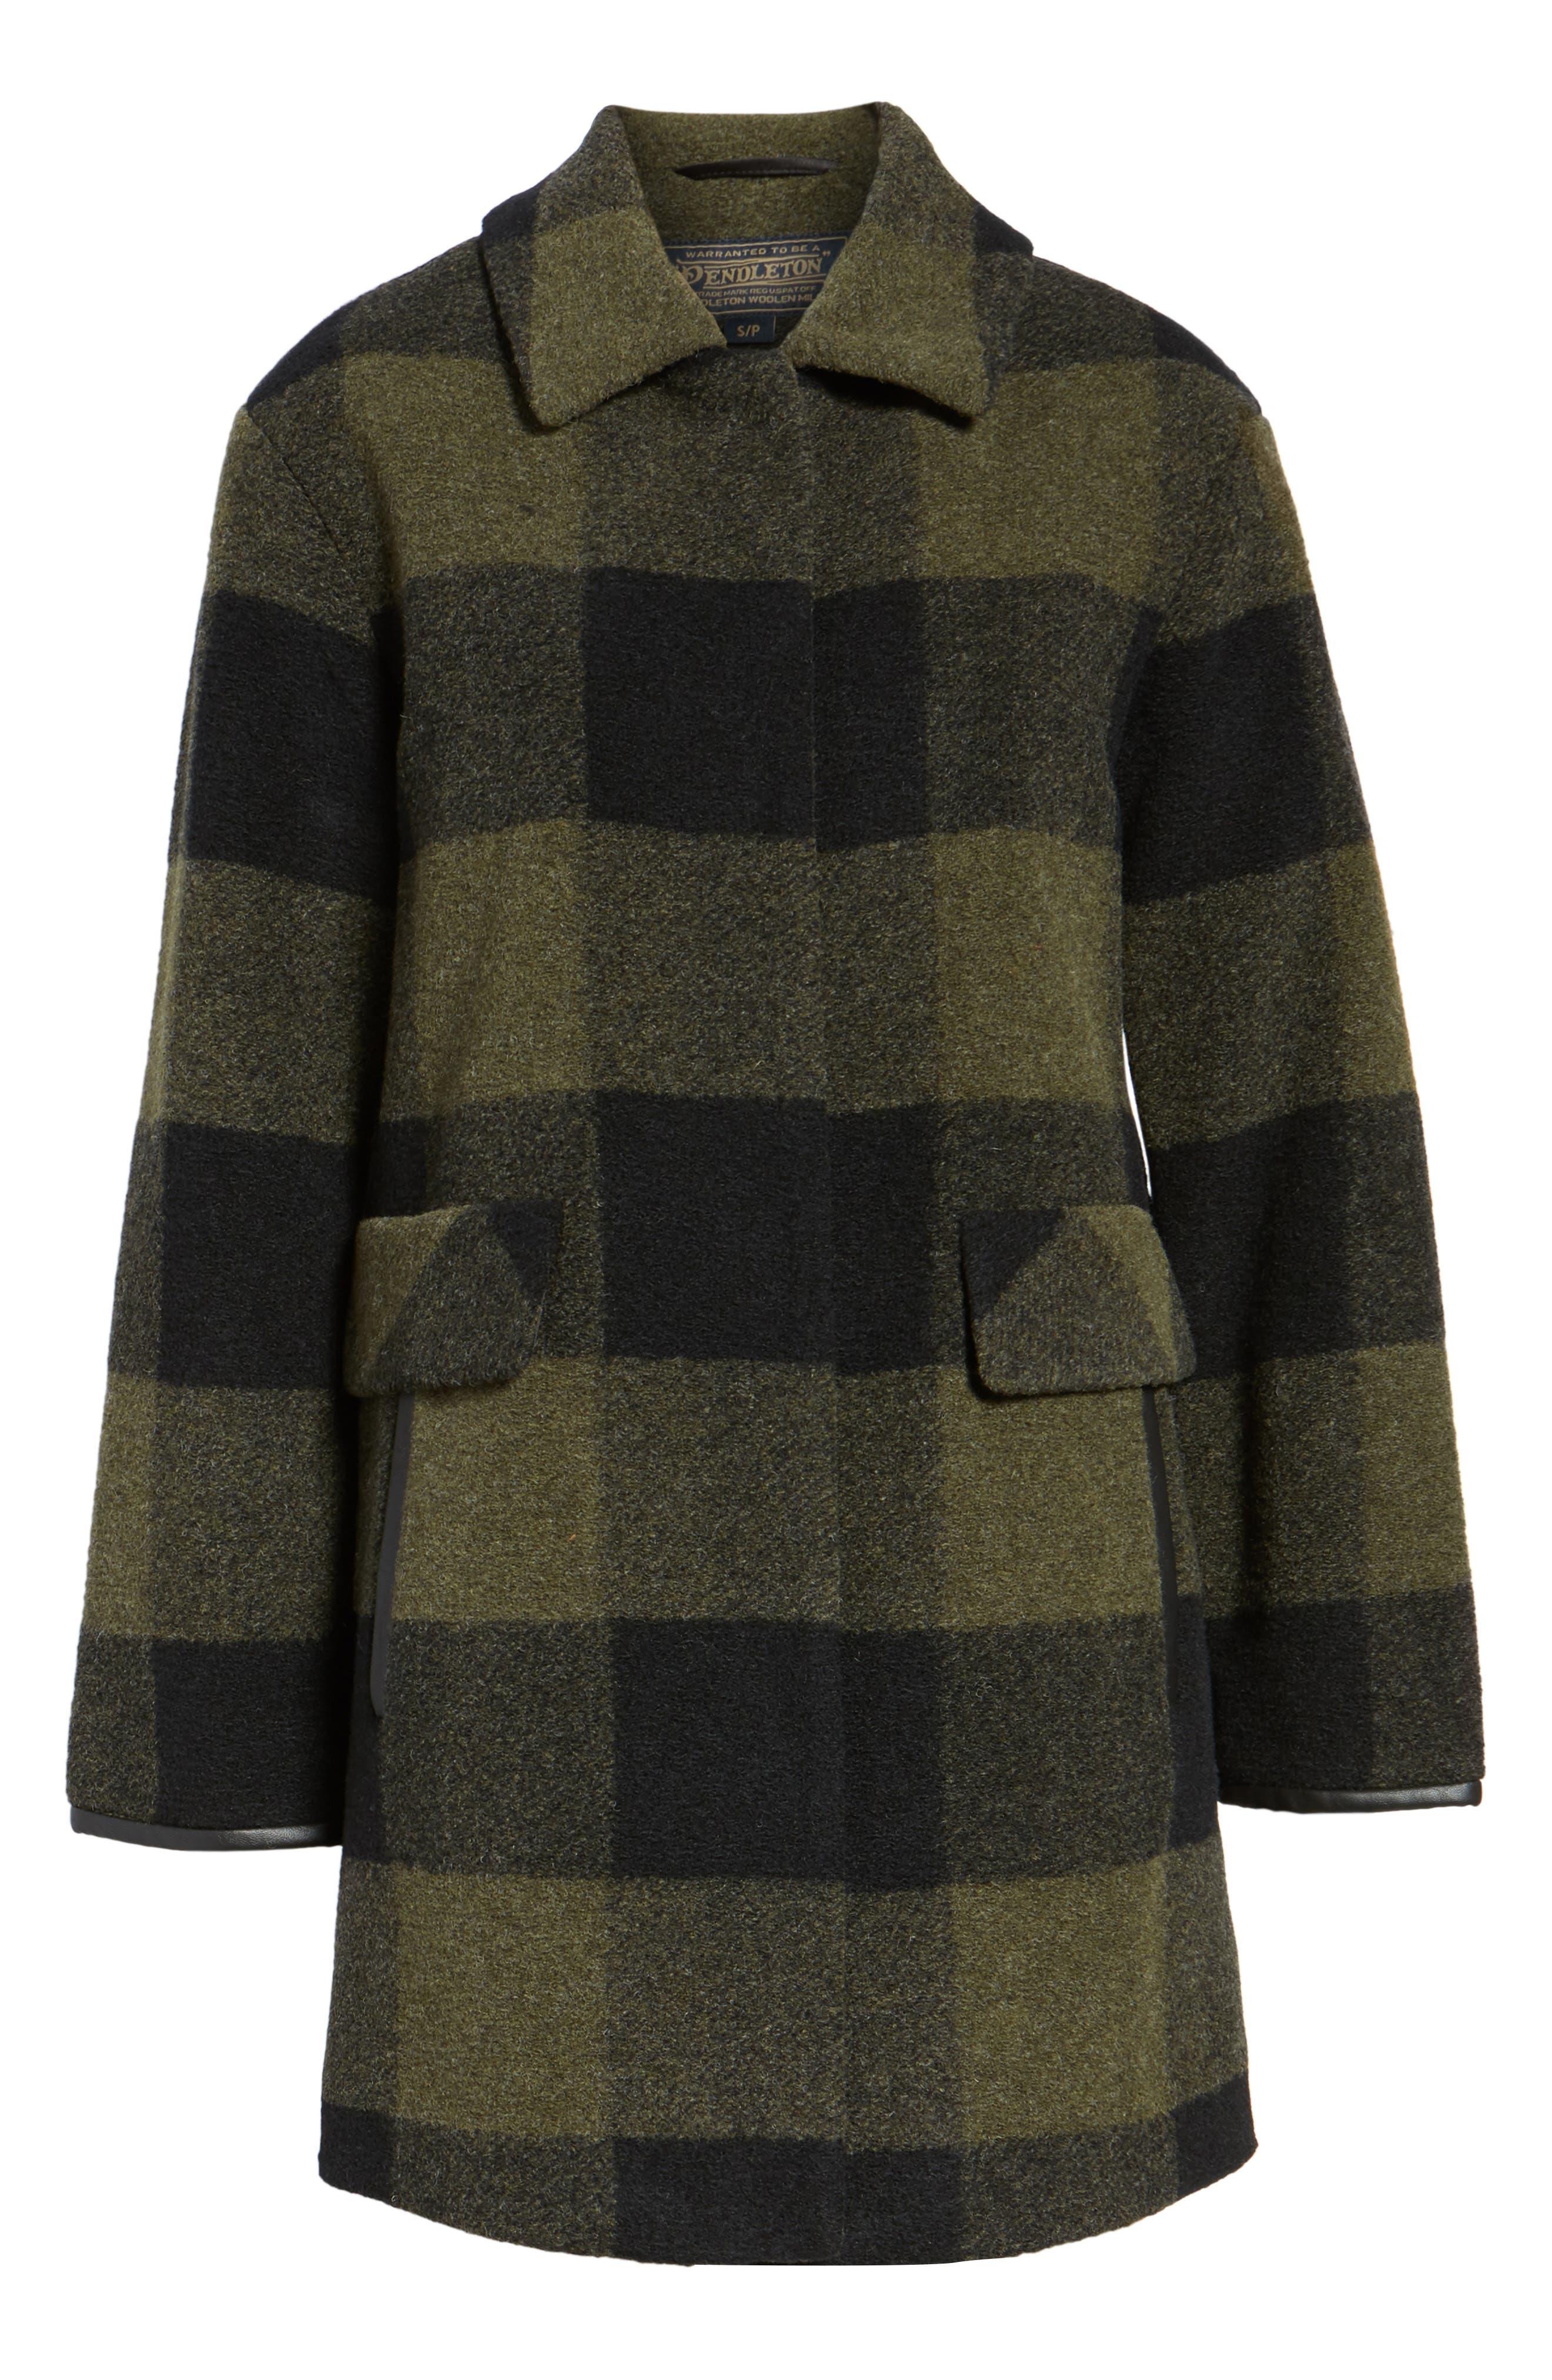 Paul Bunyan Plaid Wool Blend Barn Coat,                             Alternate thumbnail 6, color,                             Olive/ Black Plaid